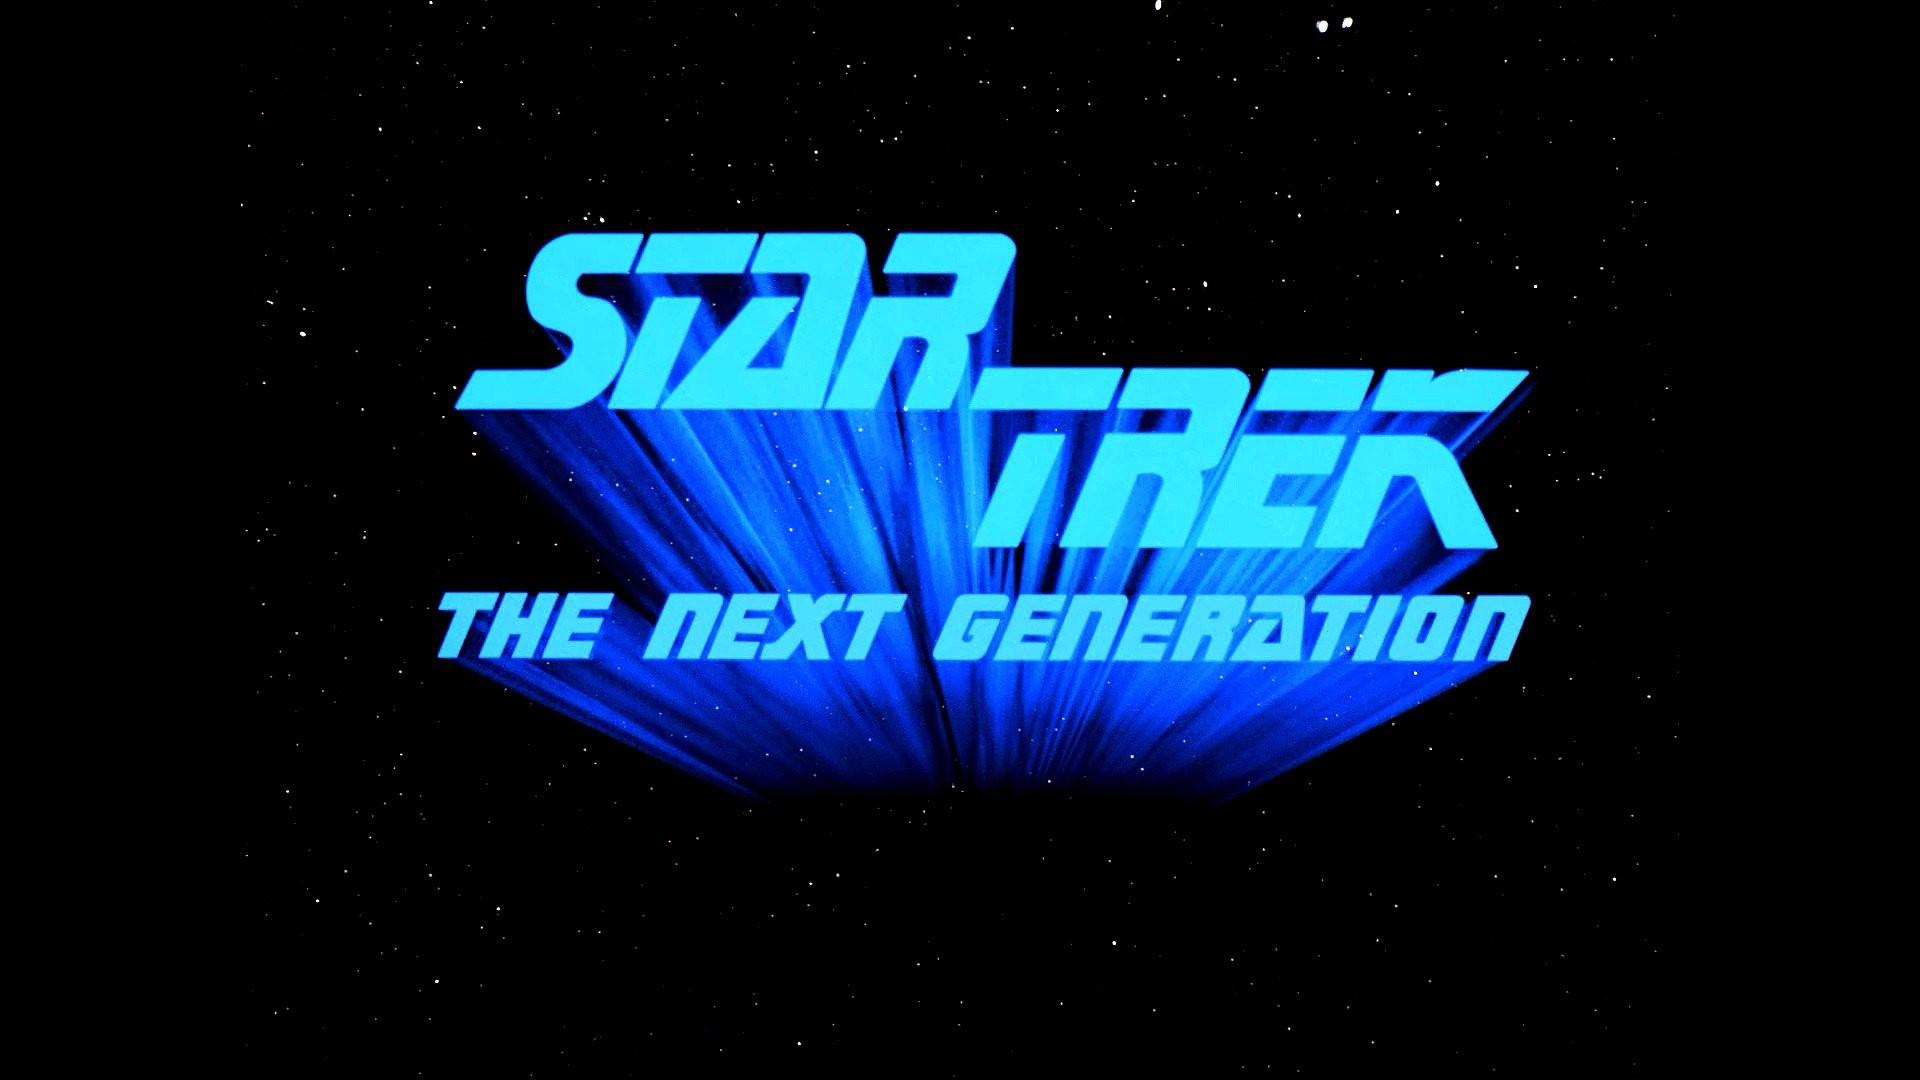 NEXT GENERATION Star Trek sci-fi adventure action television futuristic  series drama (5) wallpaper | | 261189 | WallpaperUP